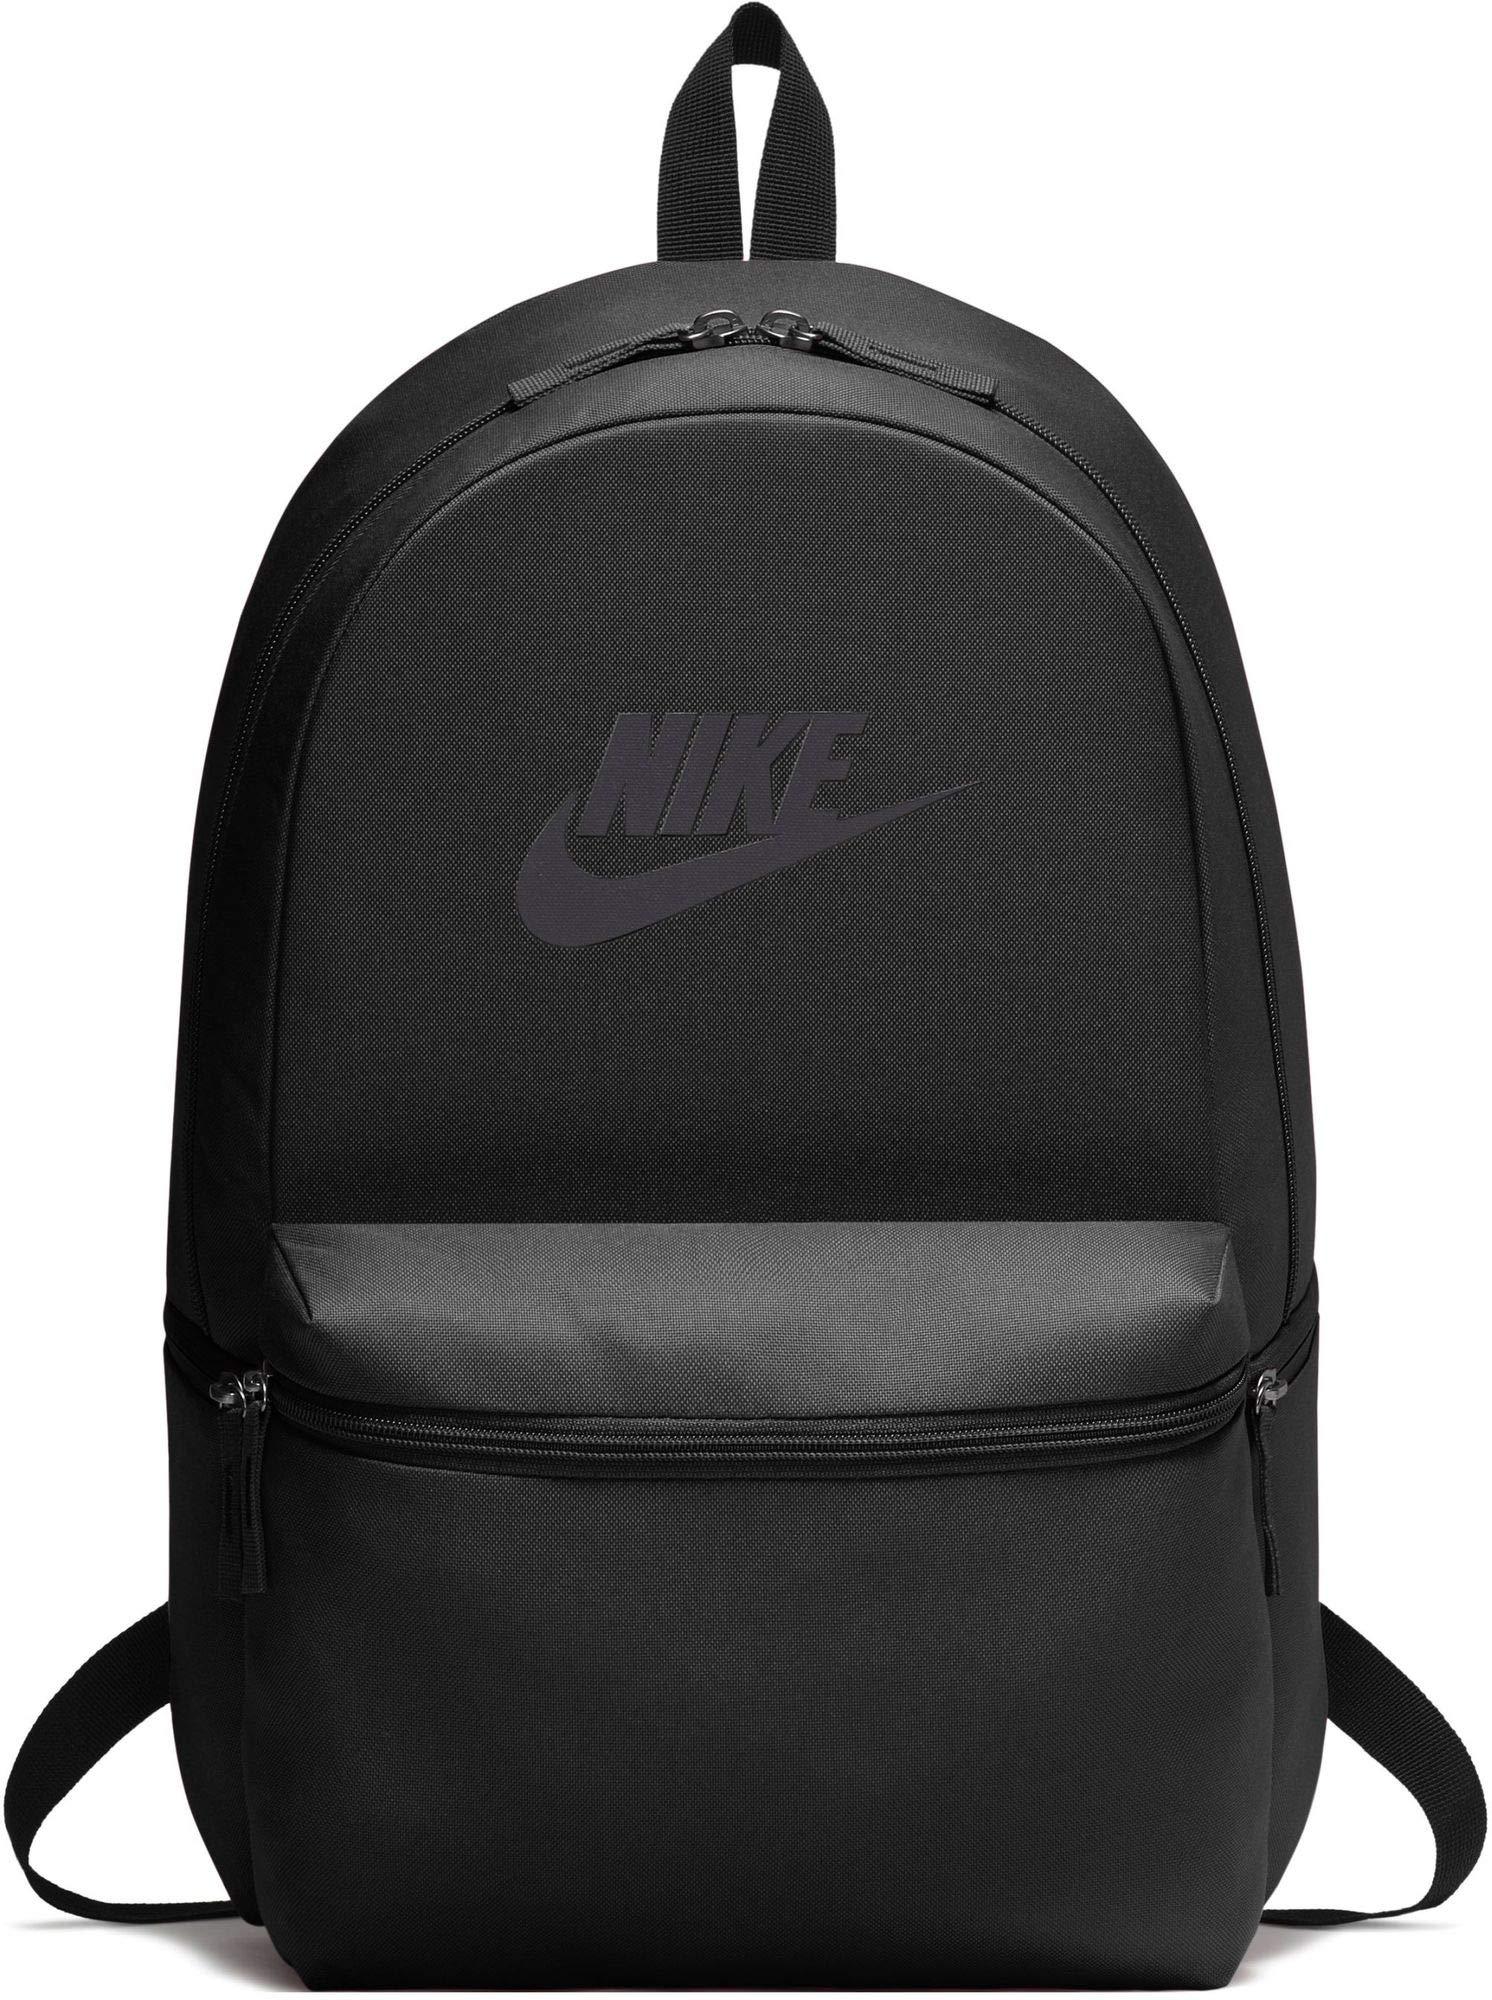 8194xr5kCeL - Nike Nk Heritage Bkpk Mochila, Unisex Adulto